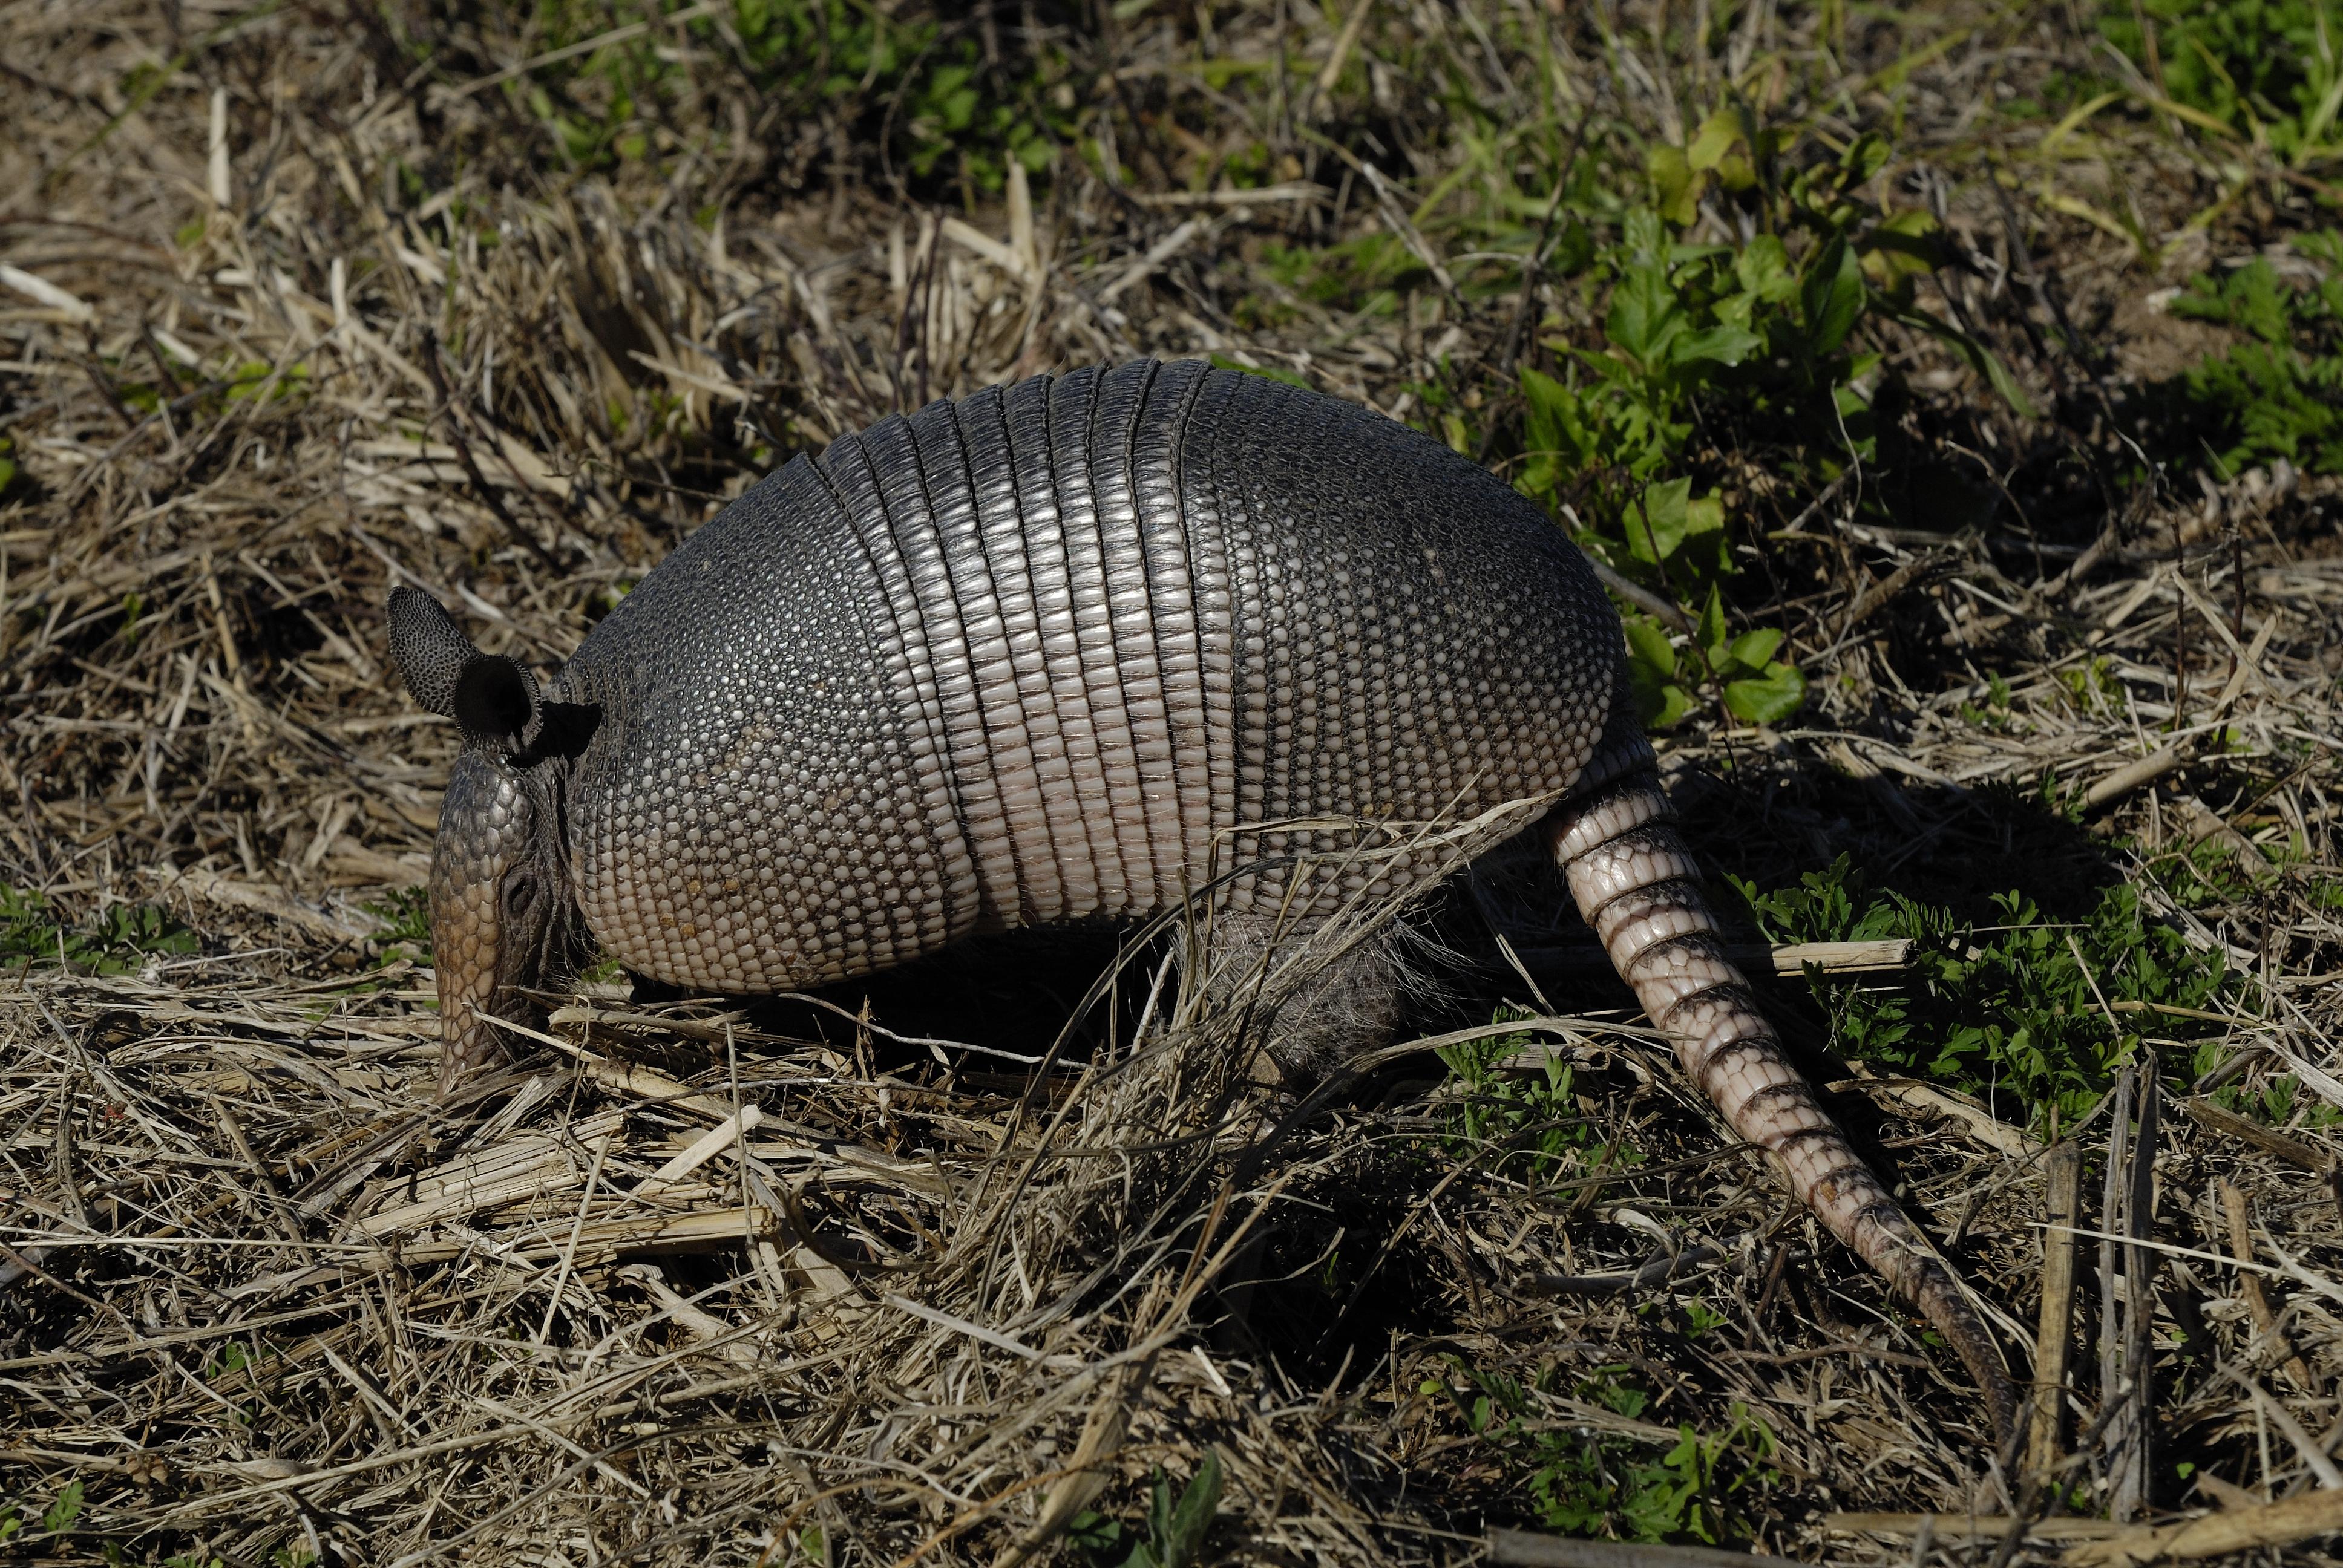 Nine-banded armadillo - Wikipedia